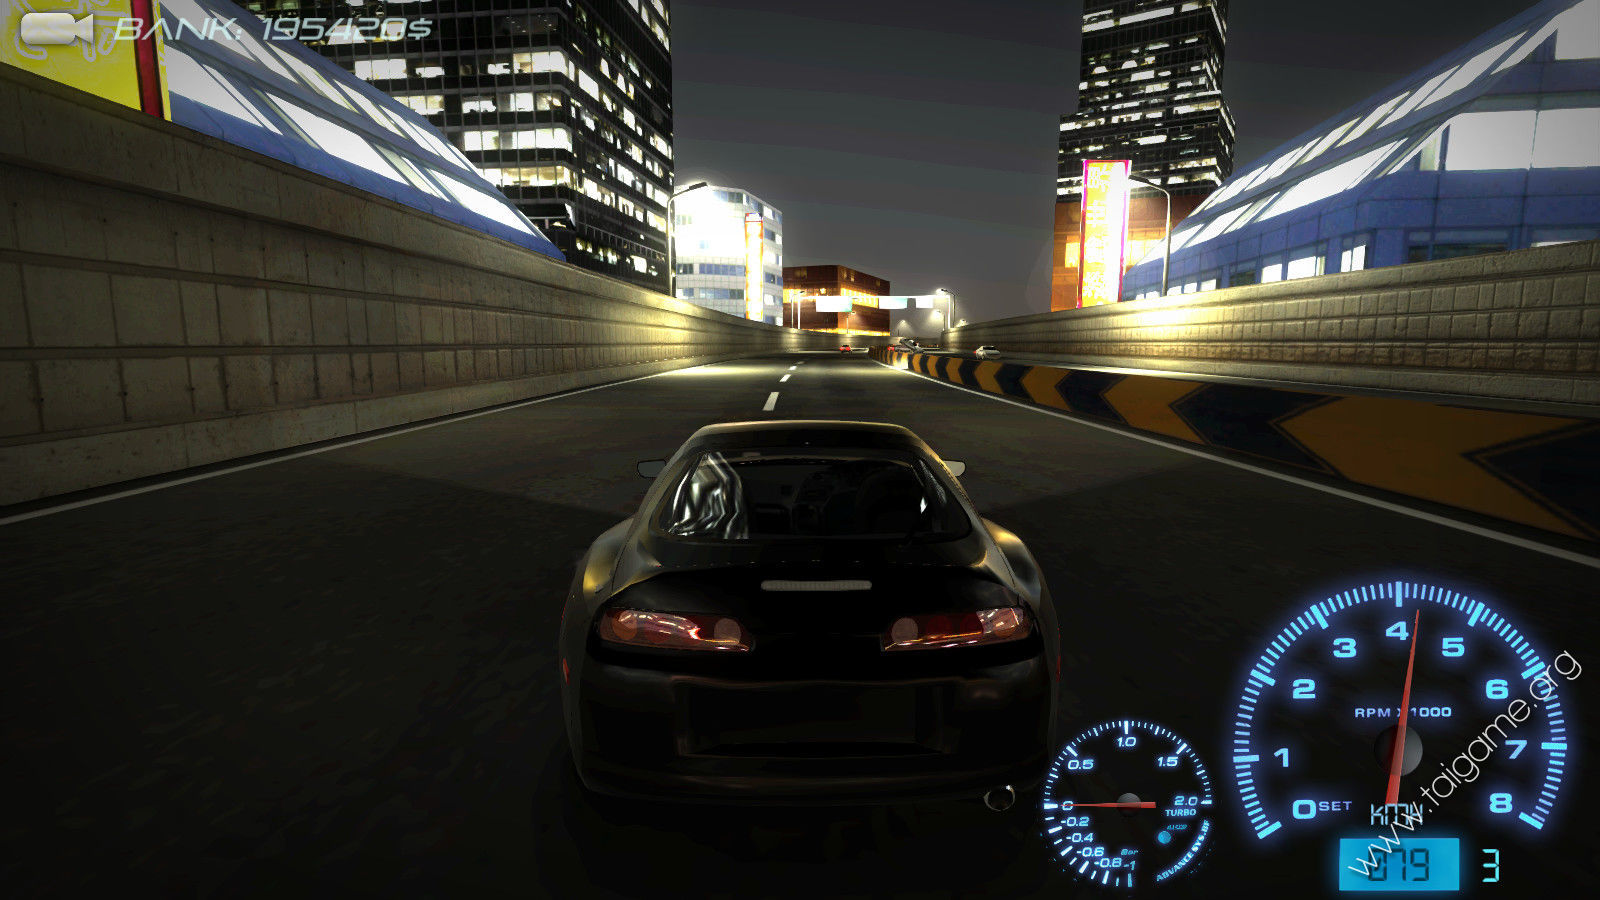 Drift Streets Japan - Download Free Full Games | Racing games